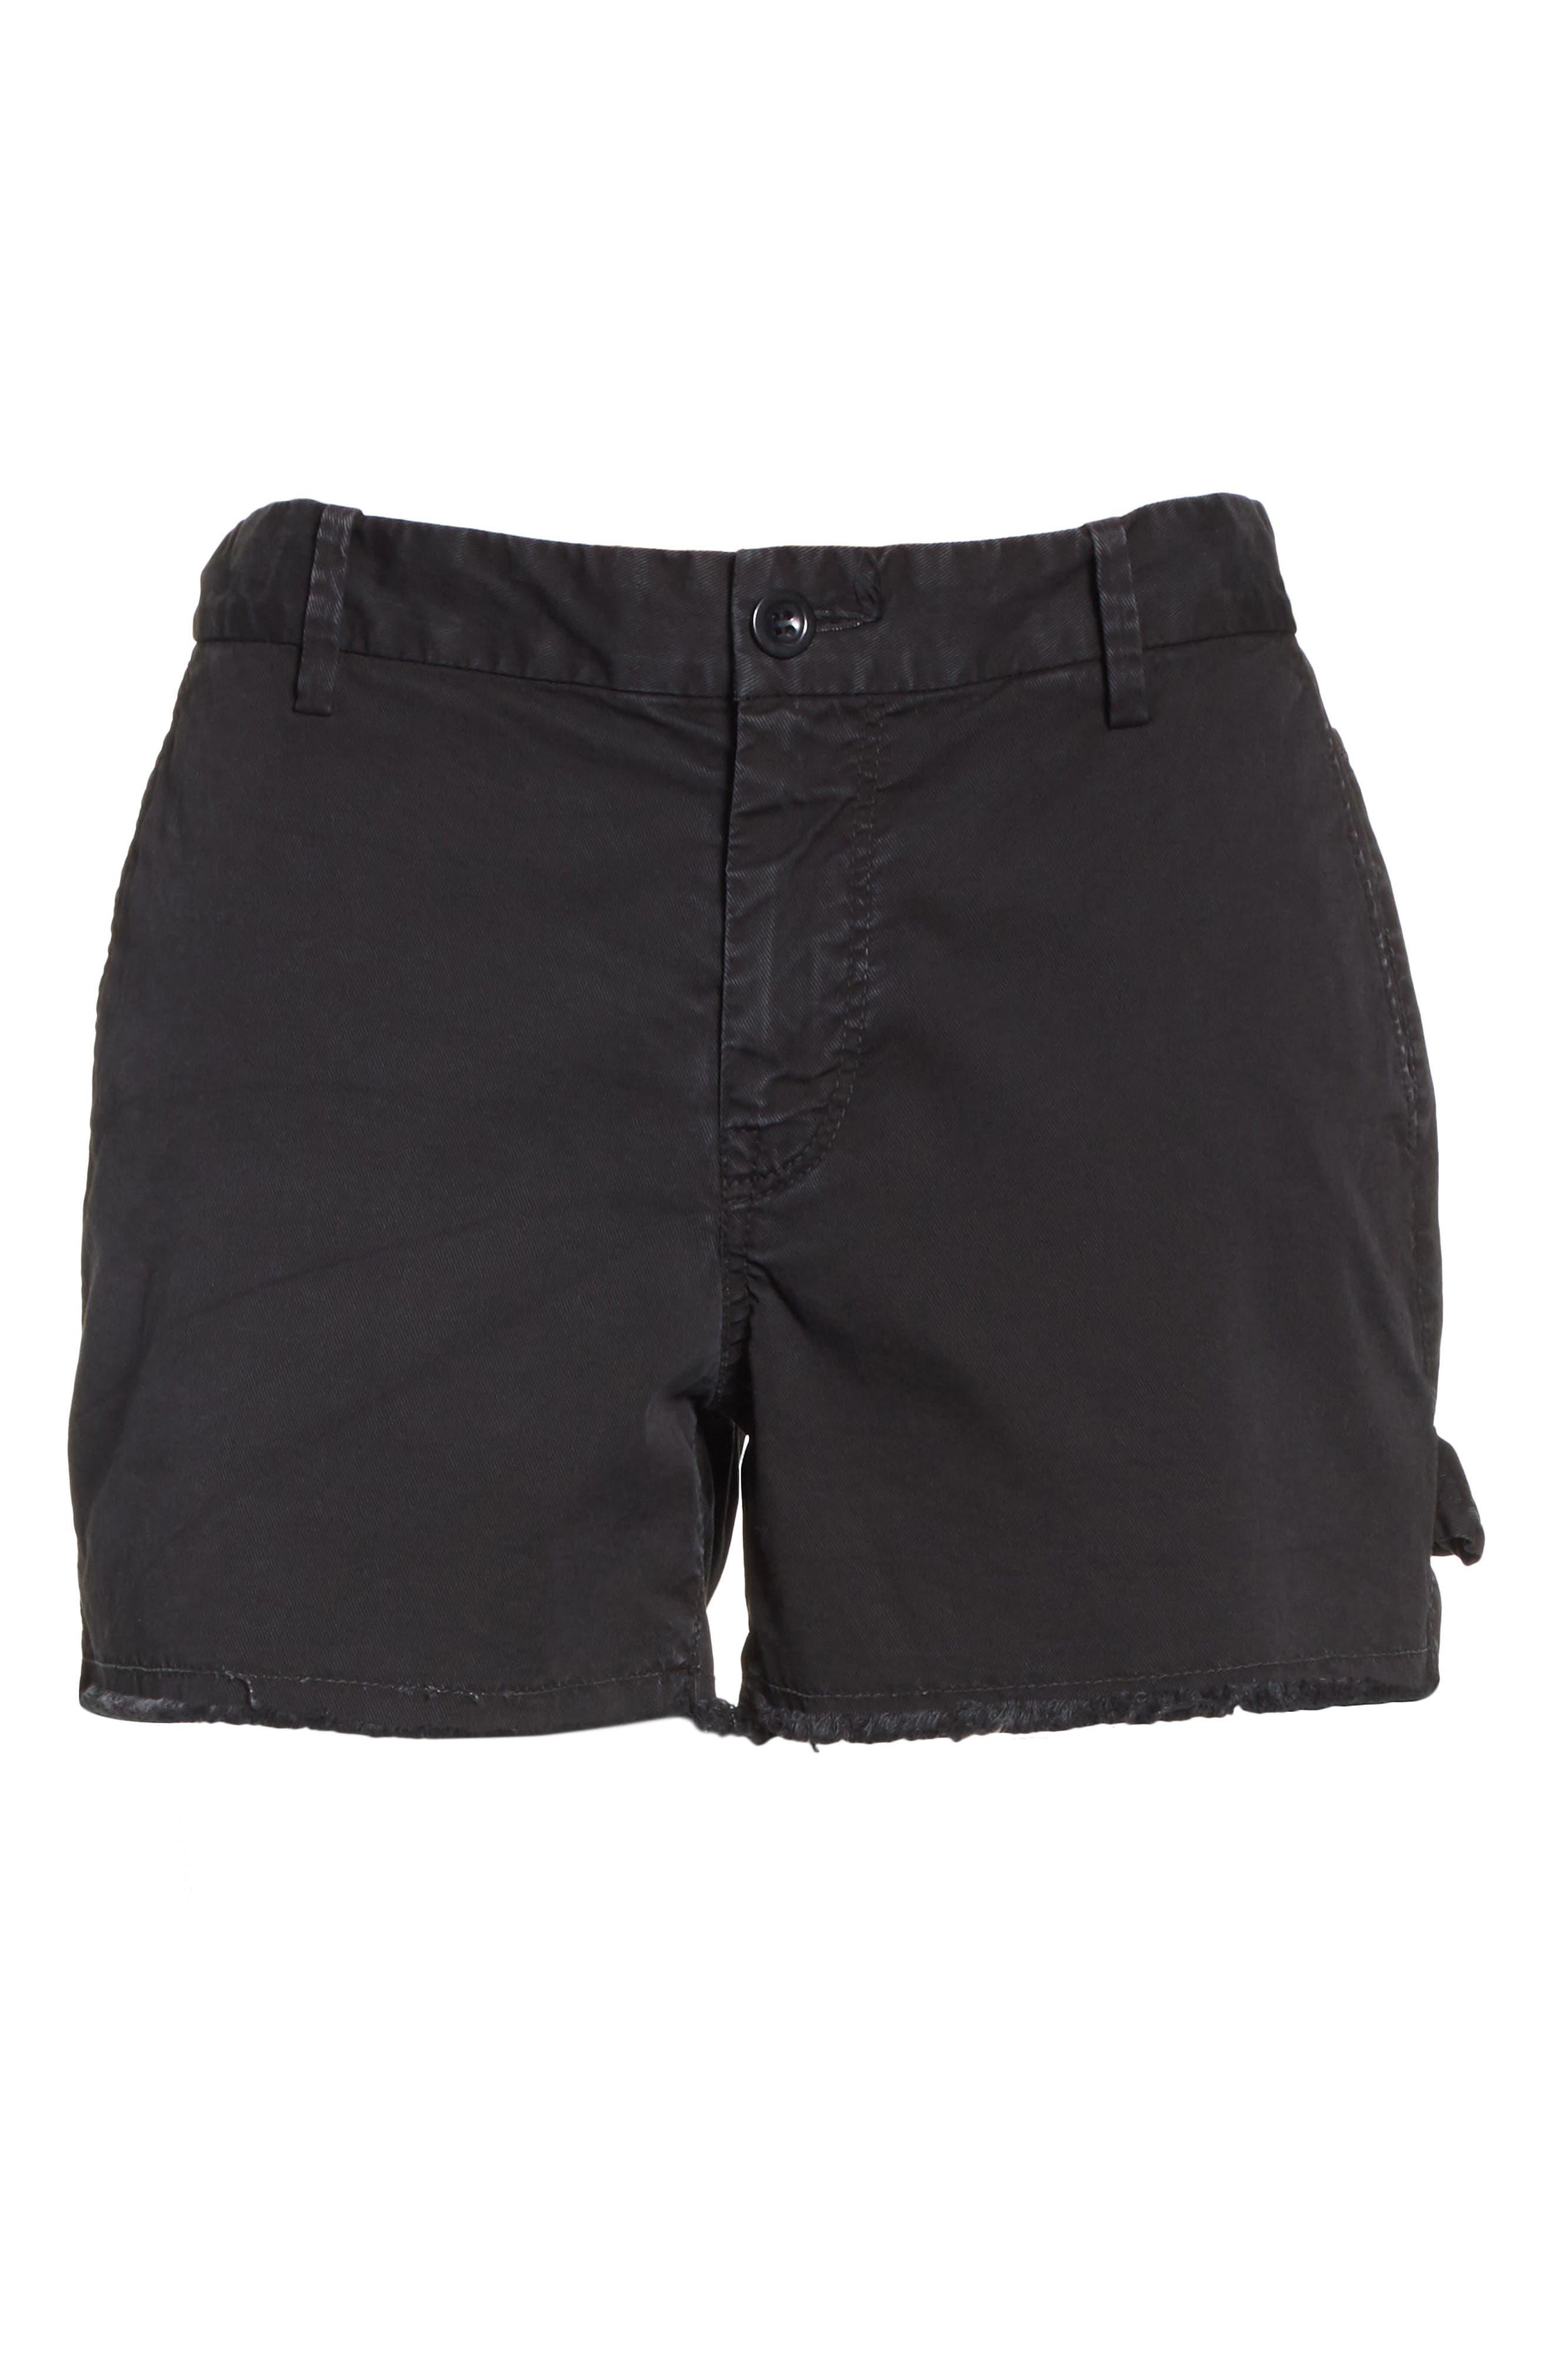 Carpenter Shorts,                             Alternate thumbnail 6, color,                             002